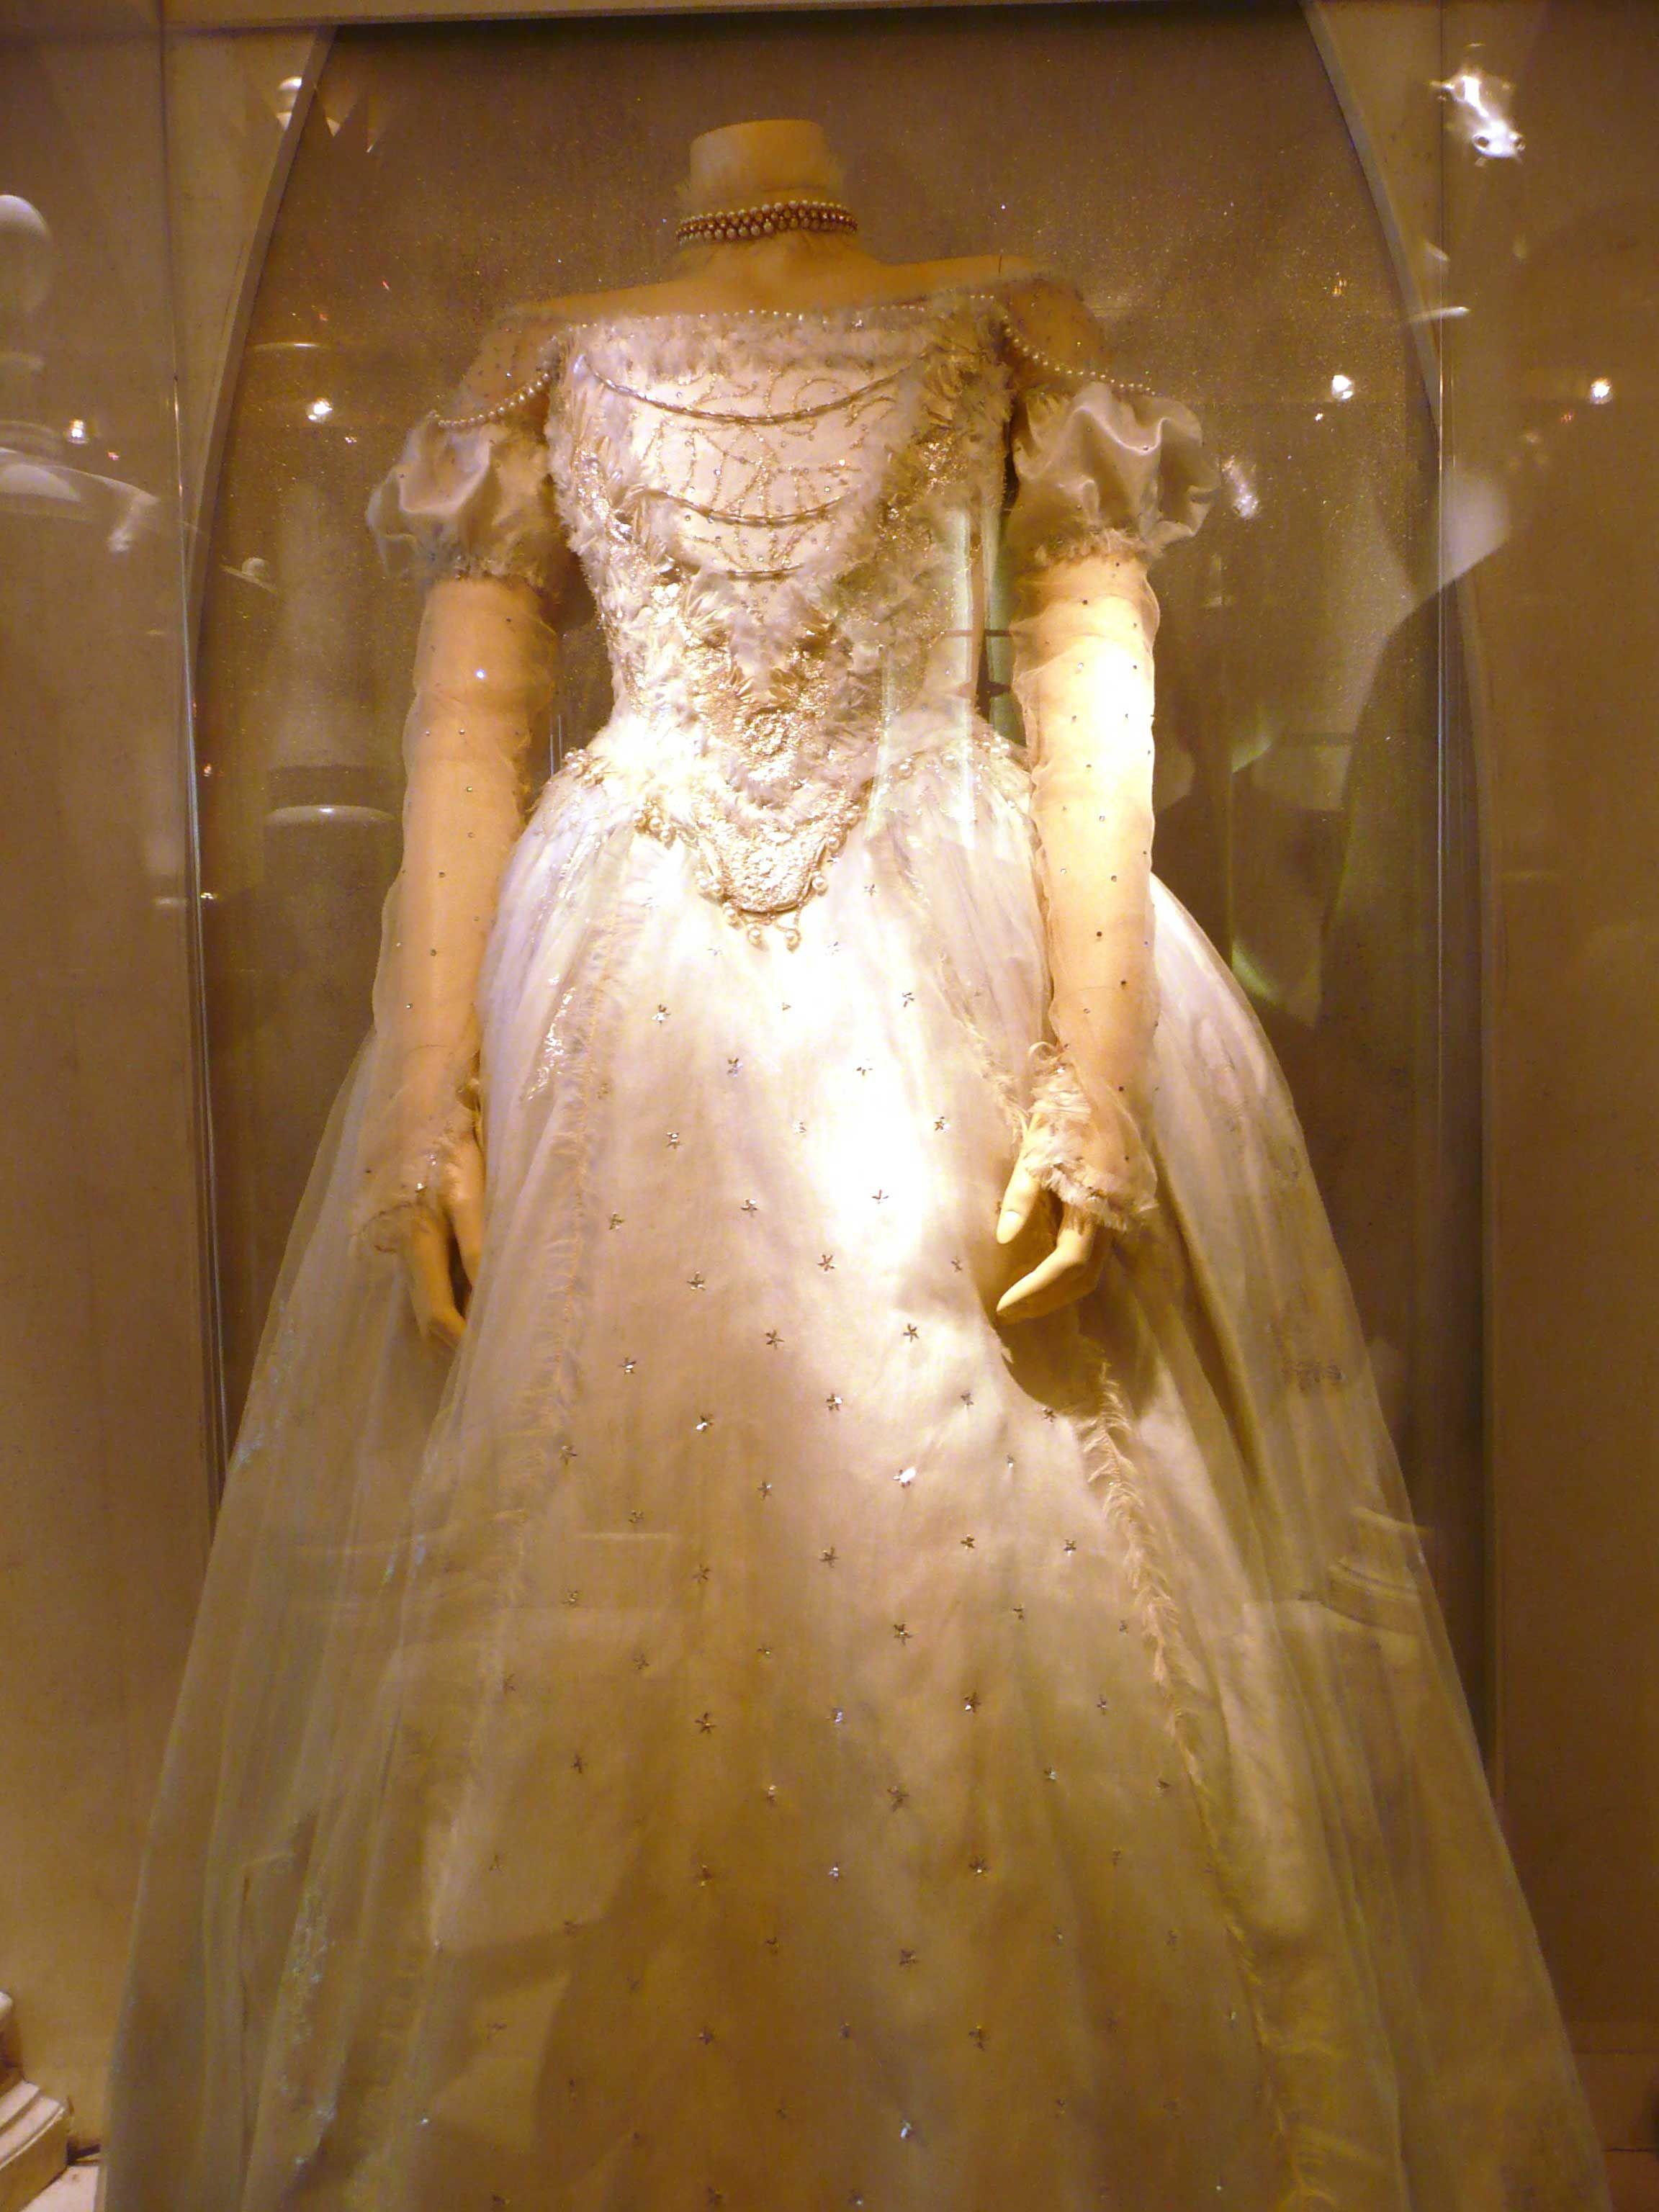 White queen tim burtonus alice and wonderland costumes for party